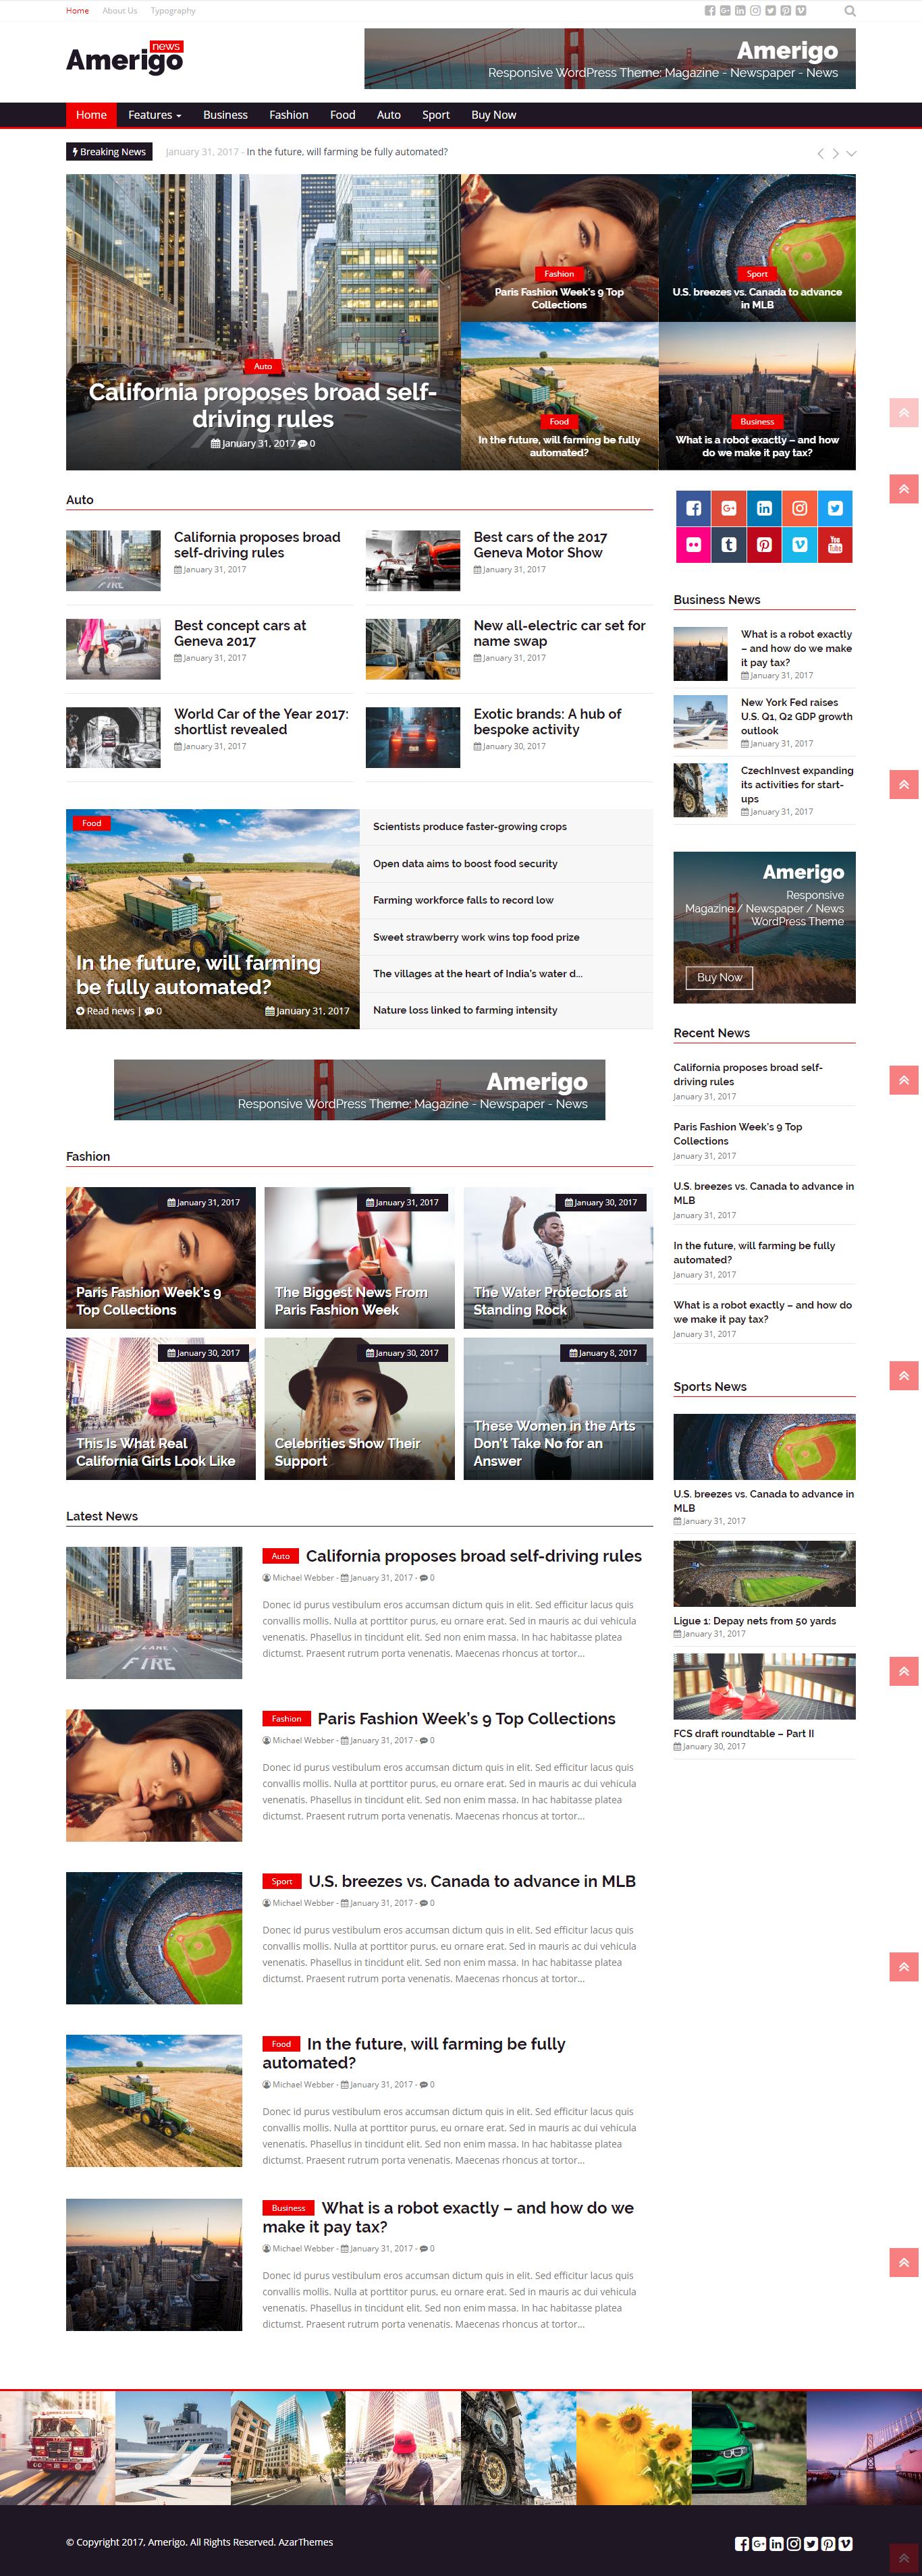 Amerigo - Responsive Newspaper / News / Magazine WordPress Theme ...